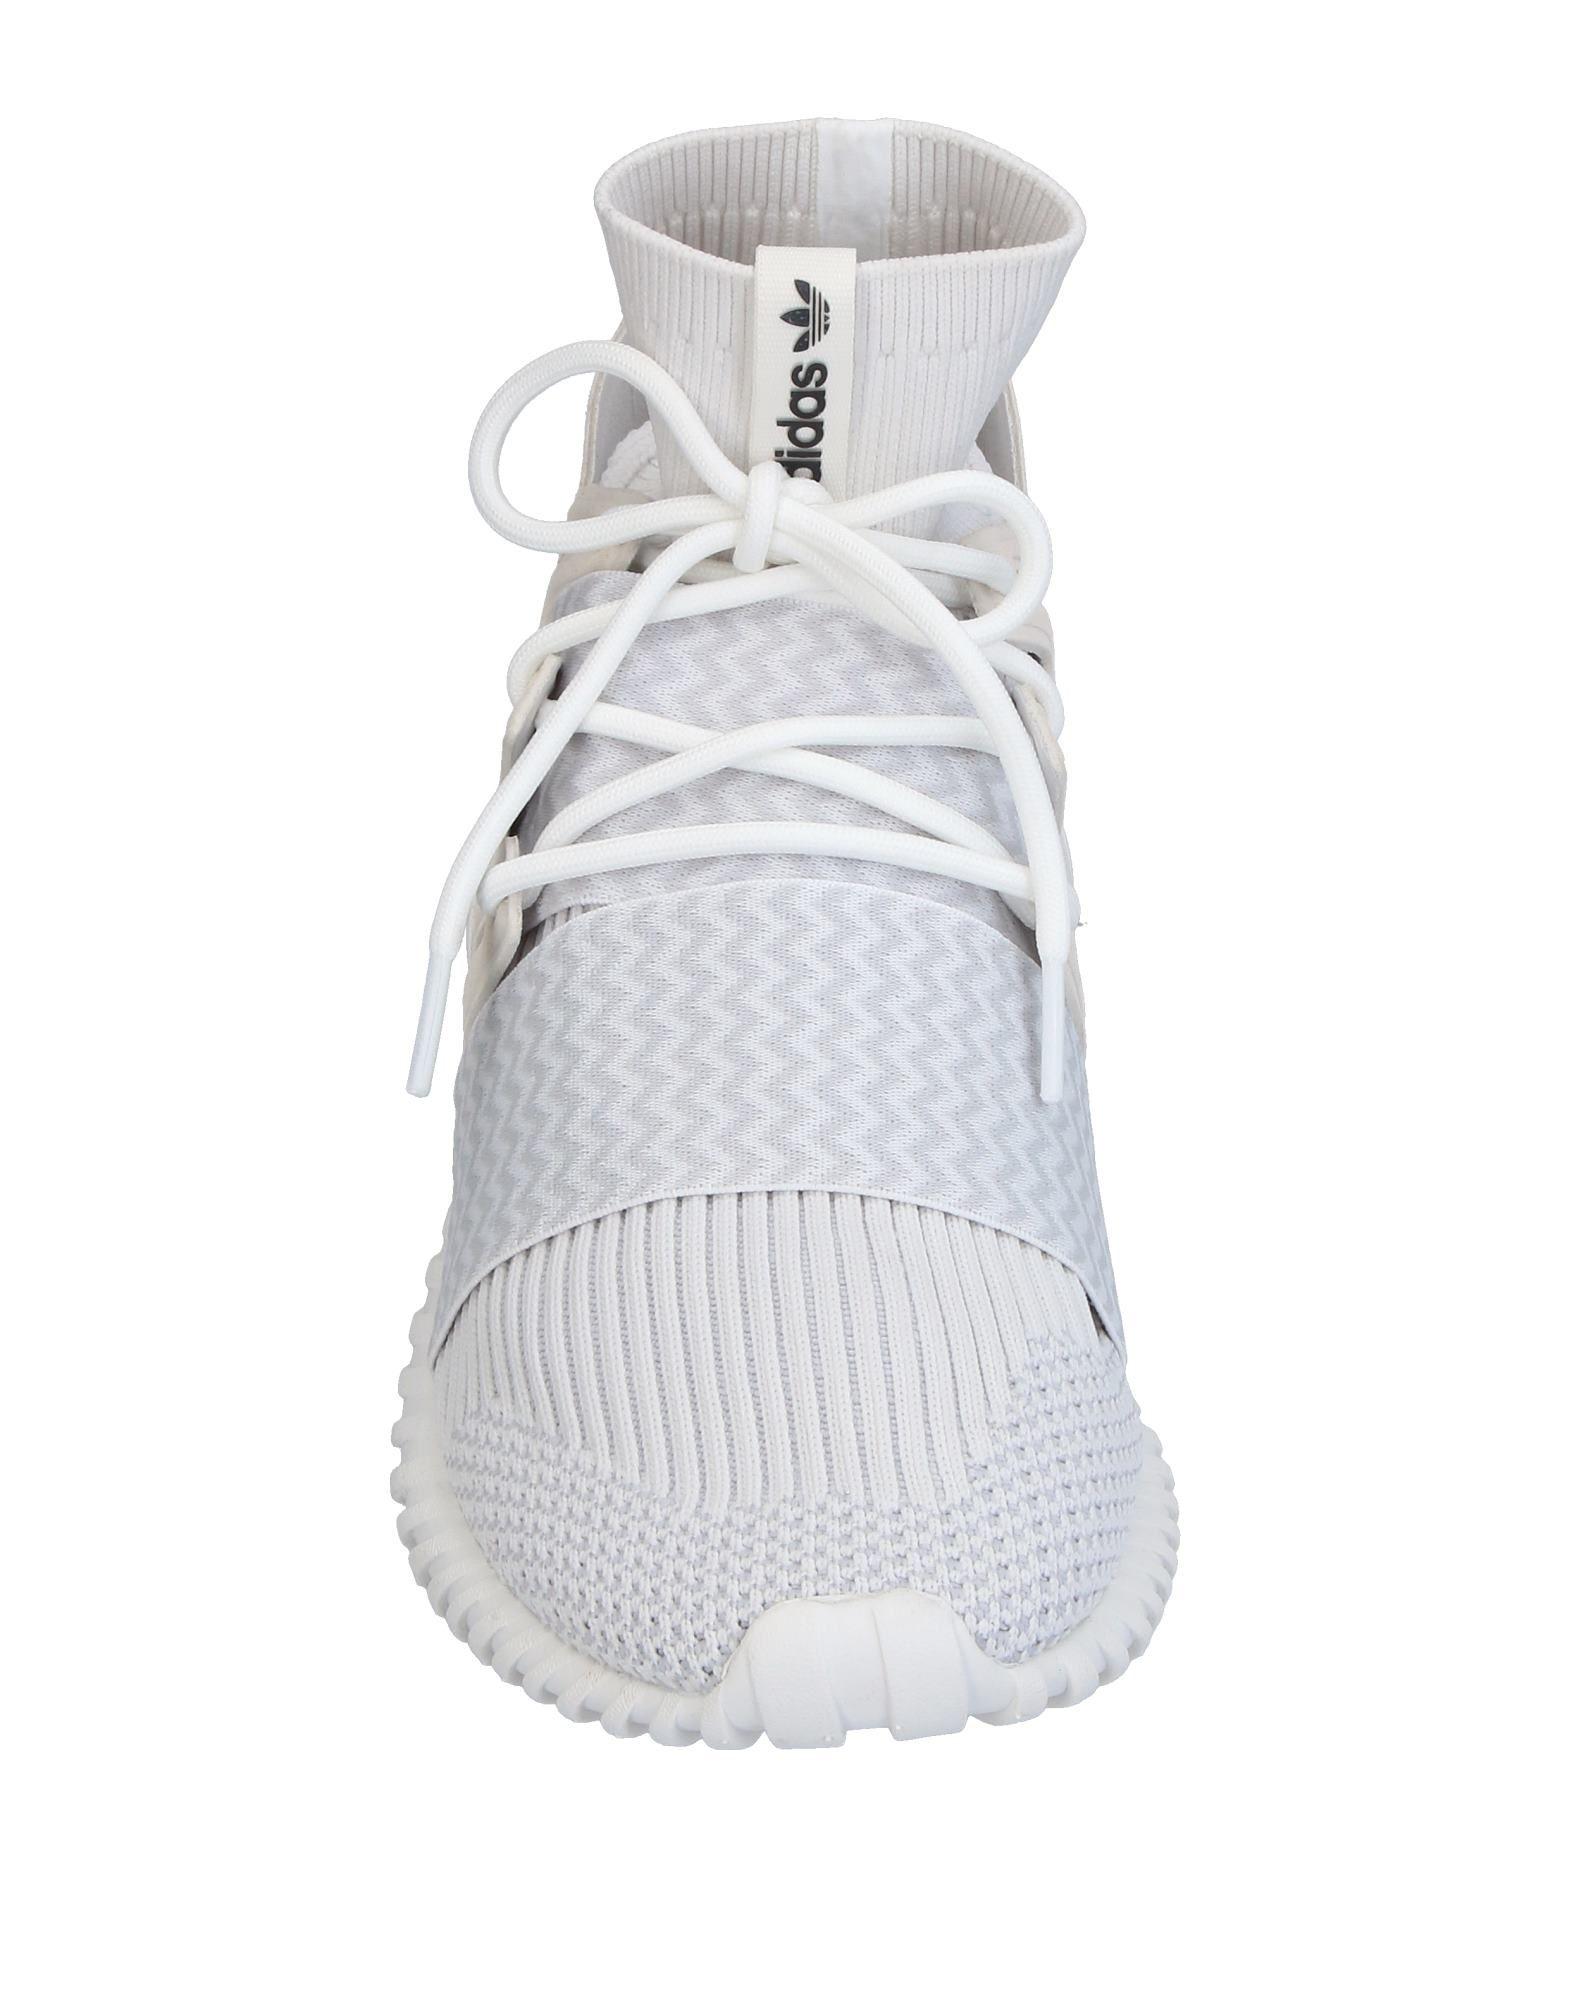 Sneakers Adidas Originals Homme - Sneakers Adidas Originals sur